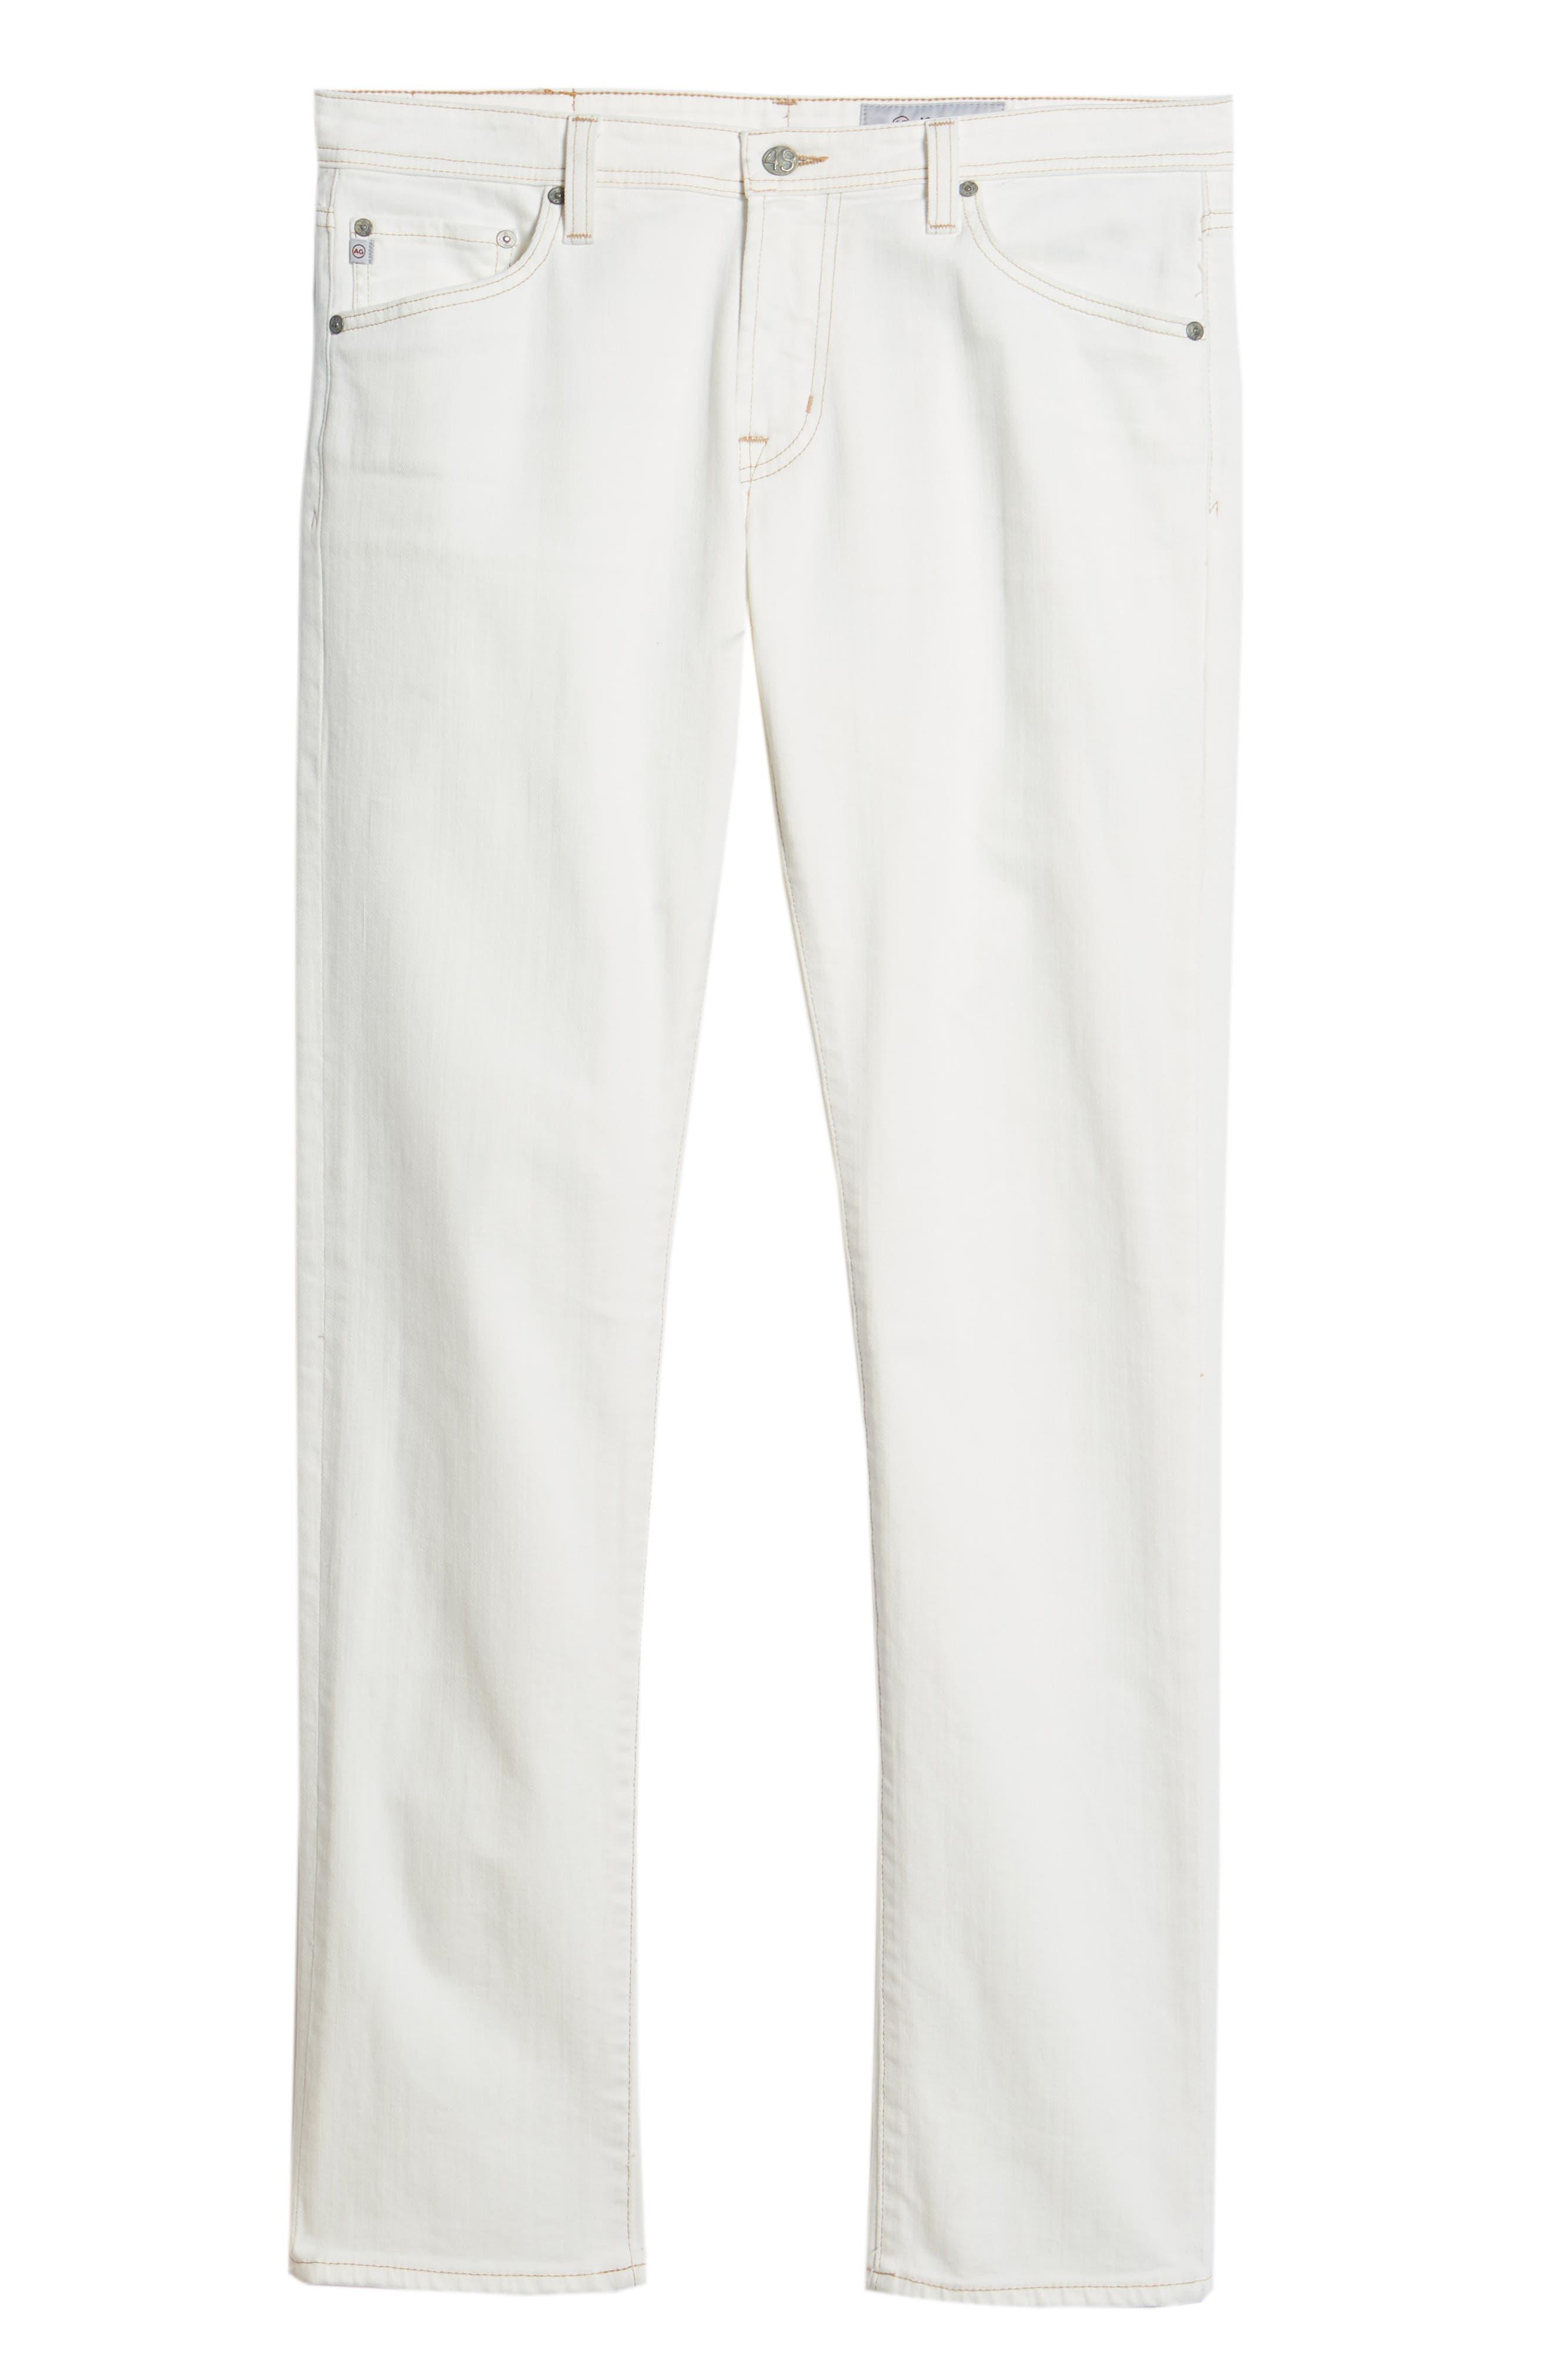 Tellis Slim Fit Jeans,                             Alternate thumbnail 6, color,                             109